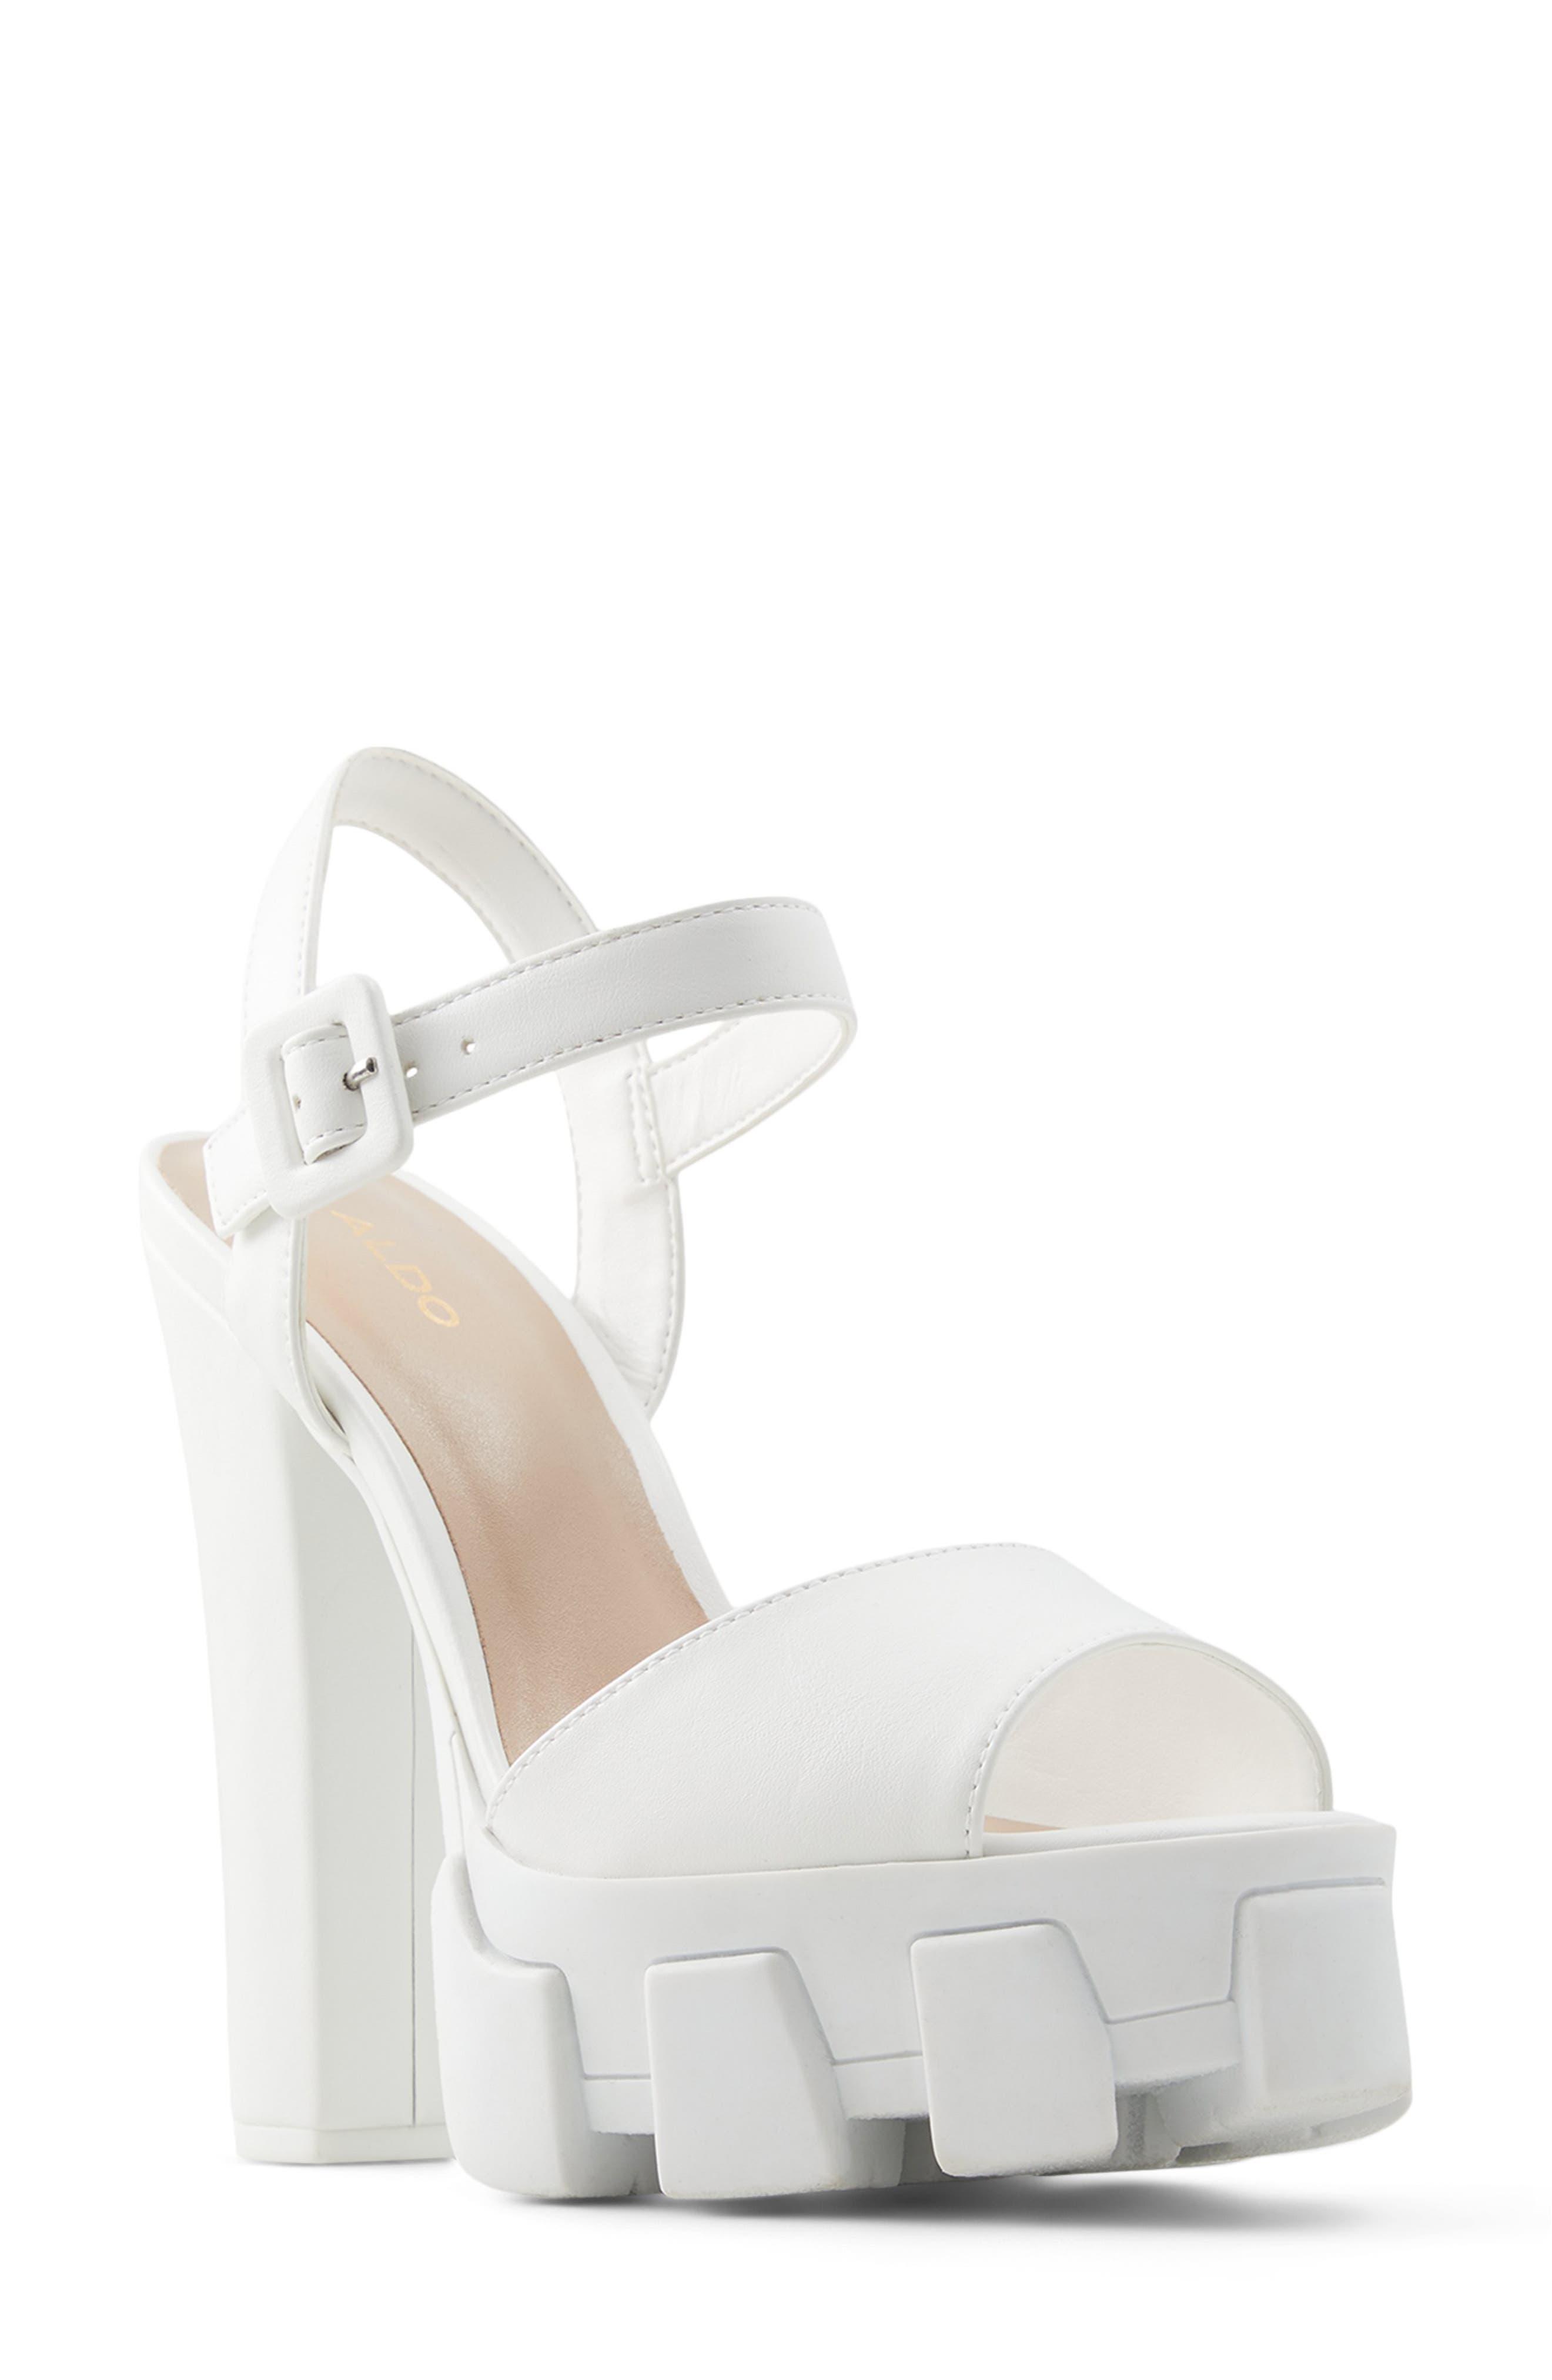 Verrajan Ankle Strap Lugged Sandal